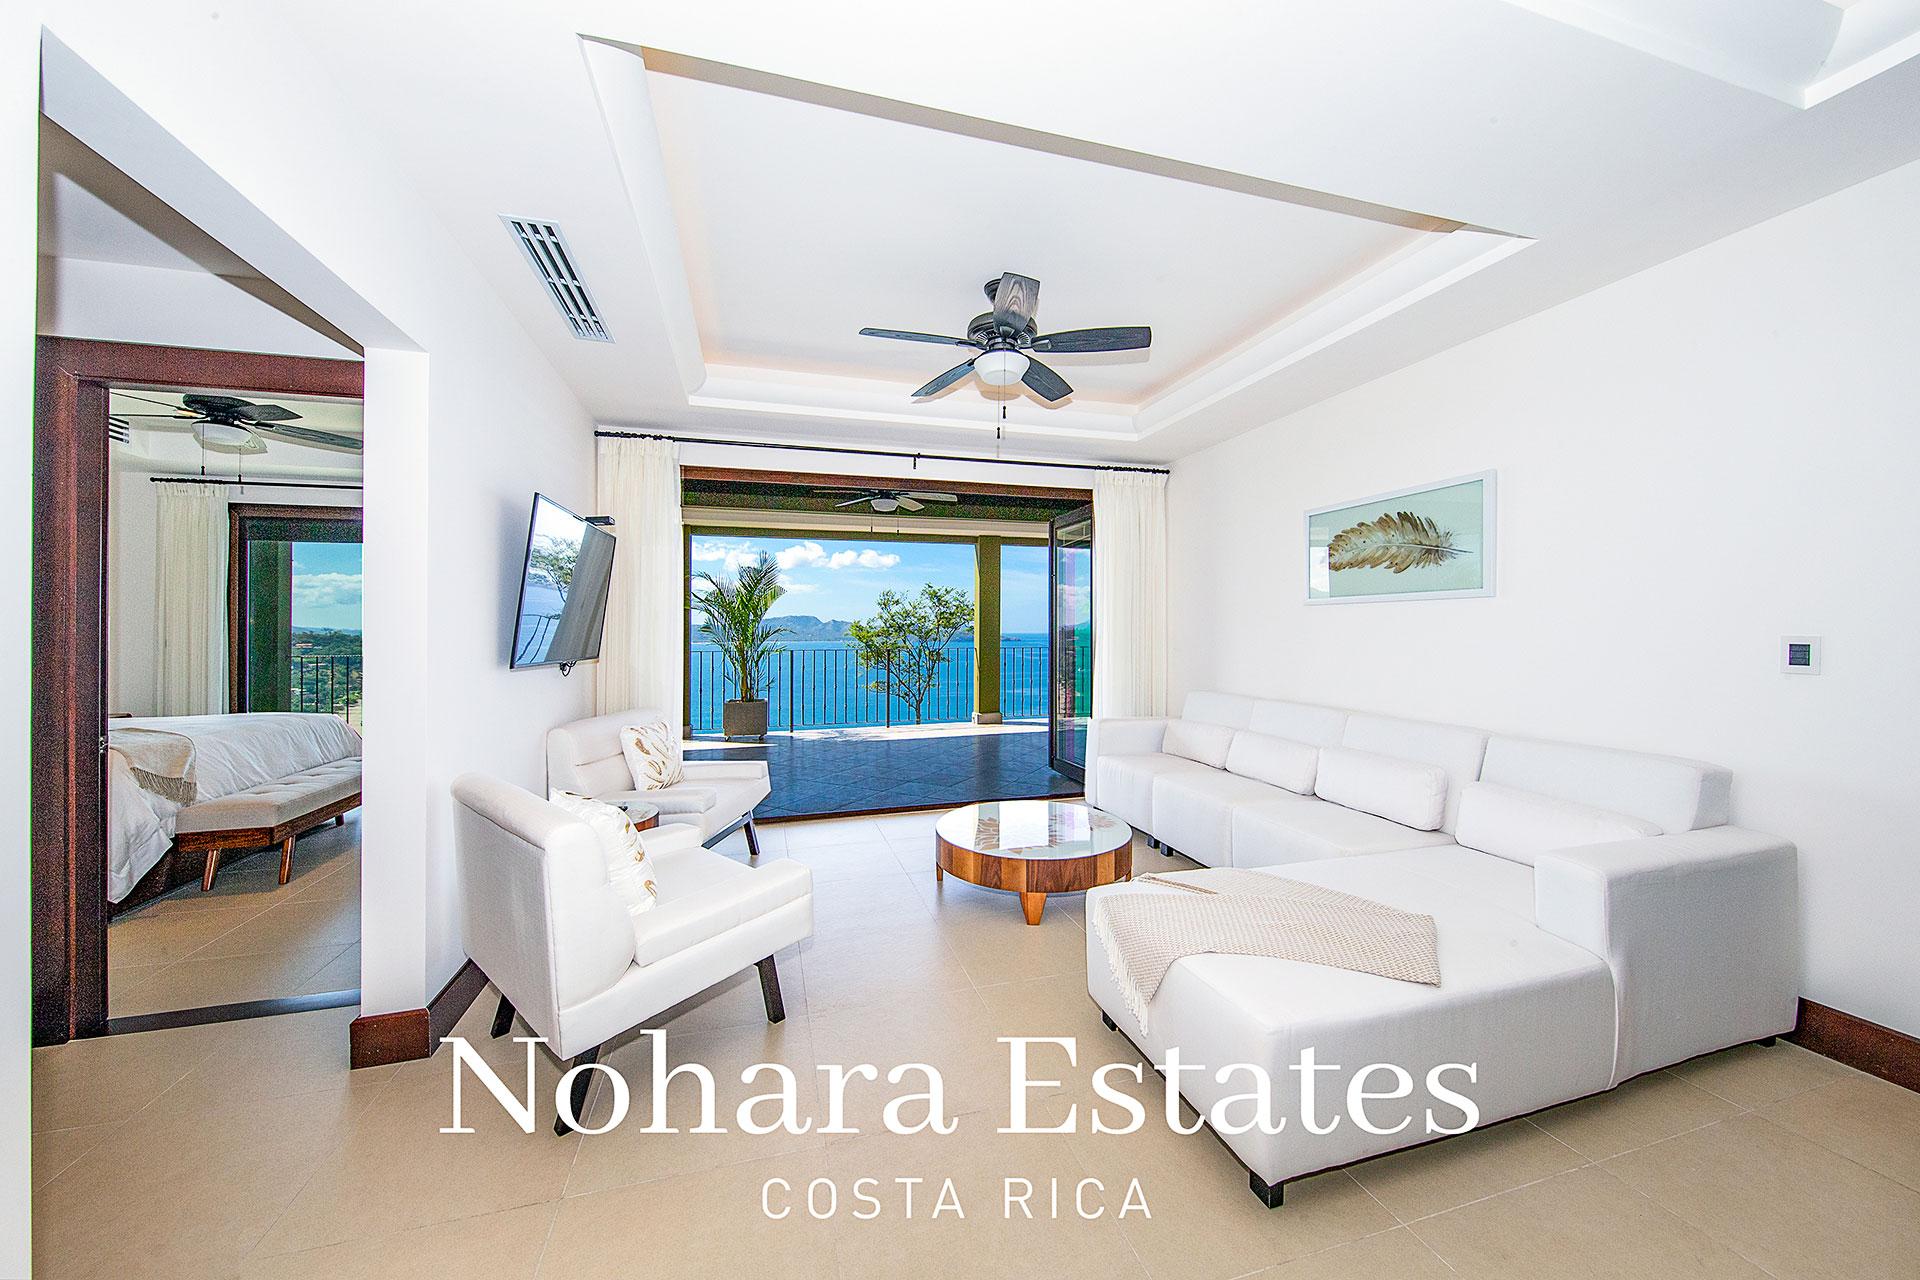 Nohara Estates Costa Rica 360 Esplendor Del Pacifico 1